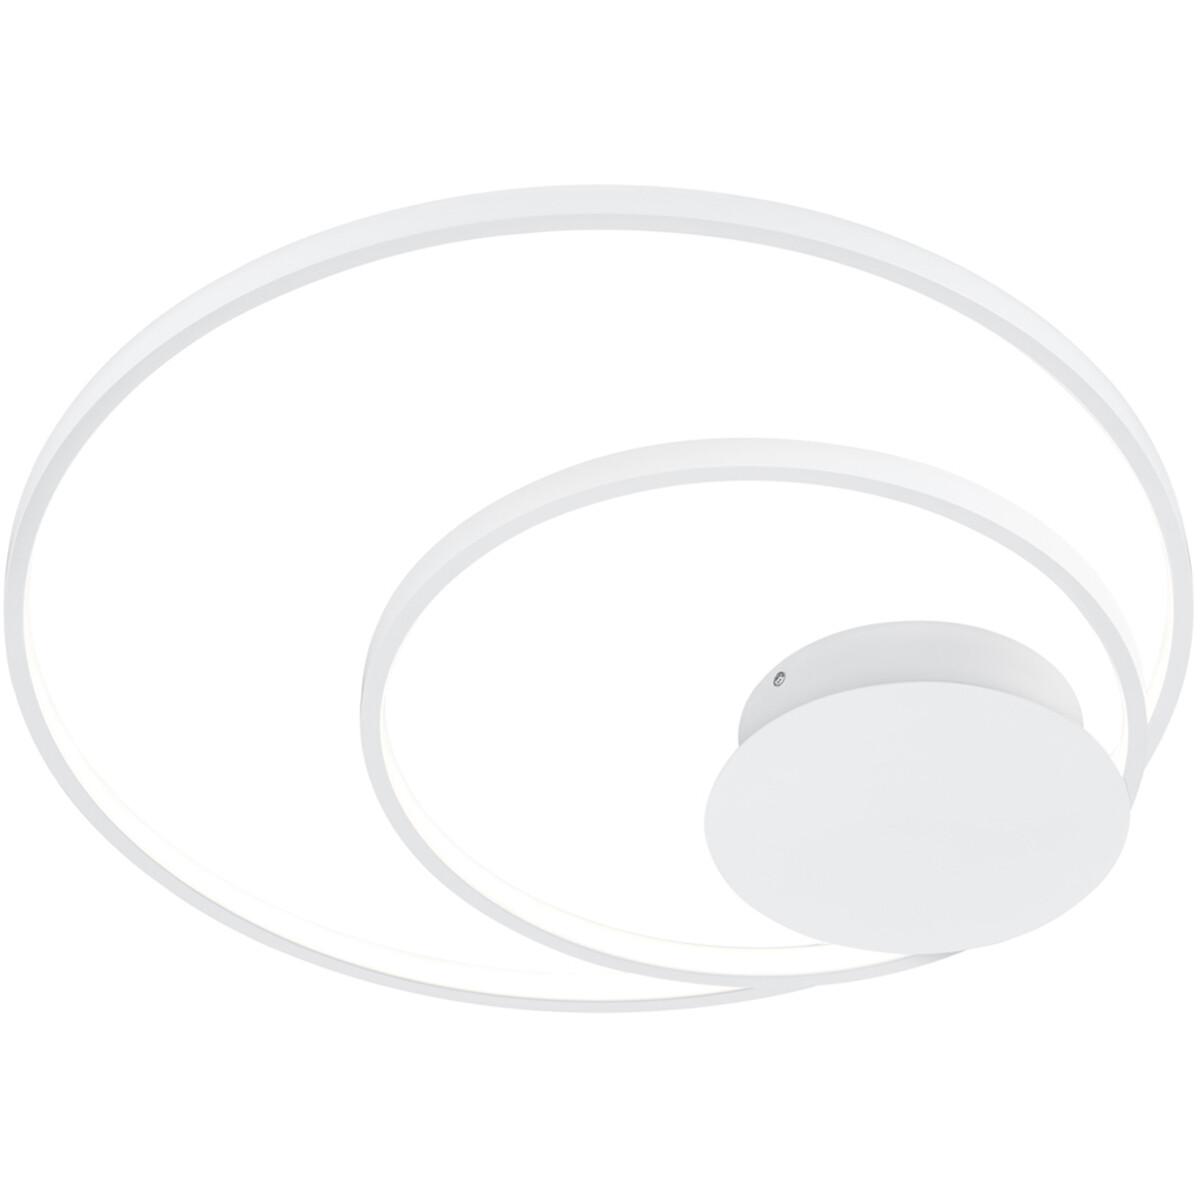 LED Plafondlamp - Plafondverlichting - Trion Sidon - 30W - Warm Wit 3000K - Dimbaar - Rond - Mat Wit